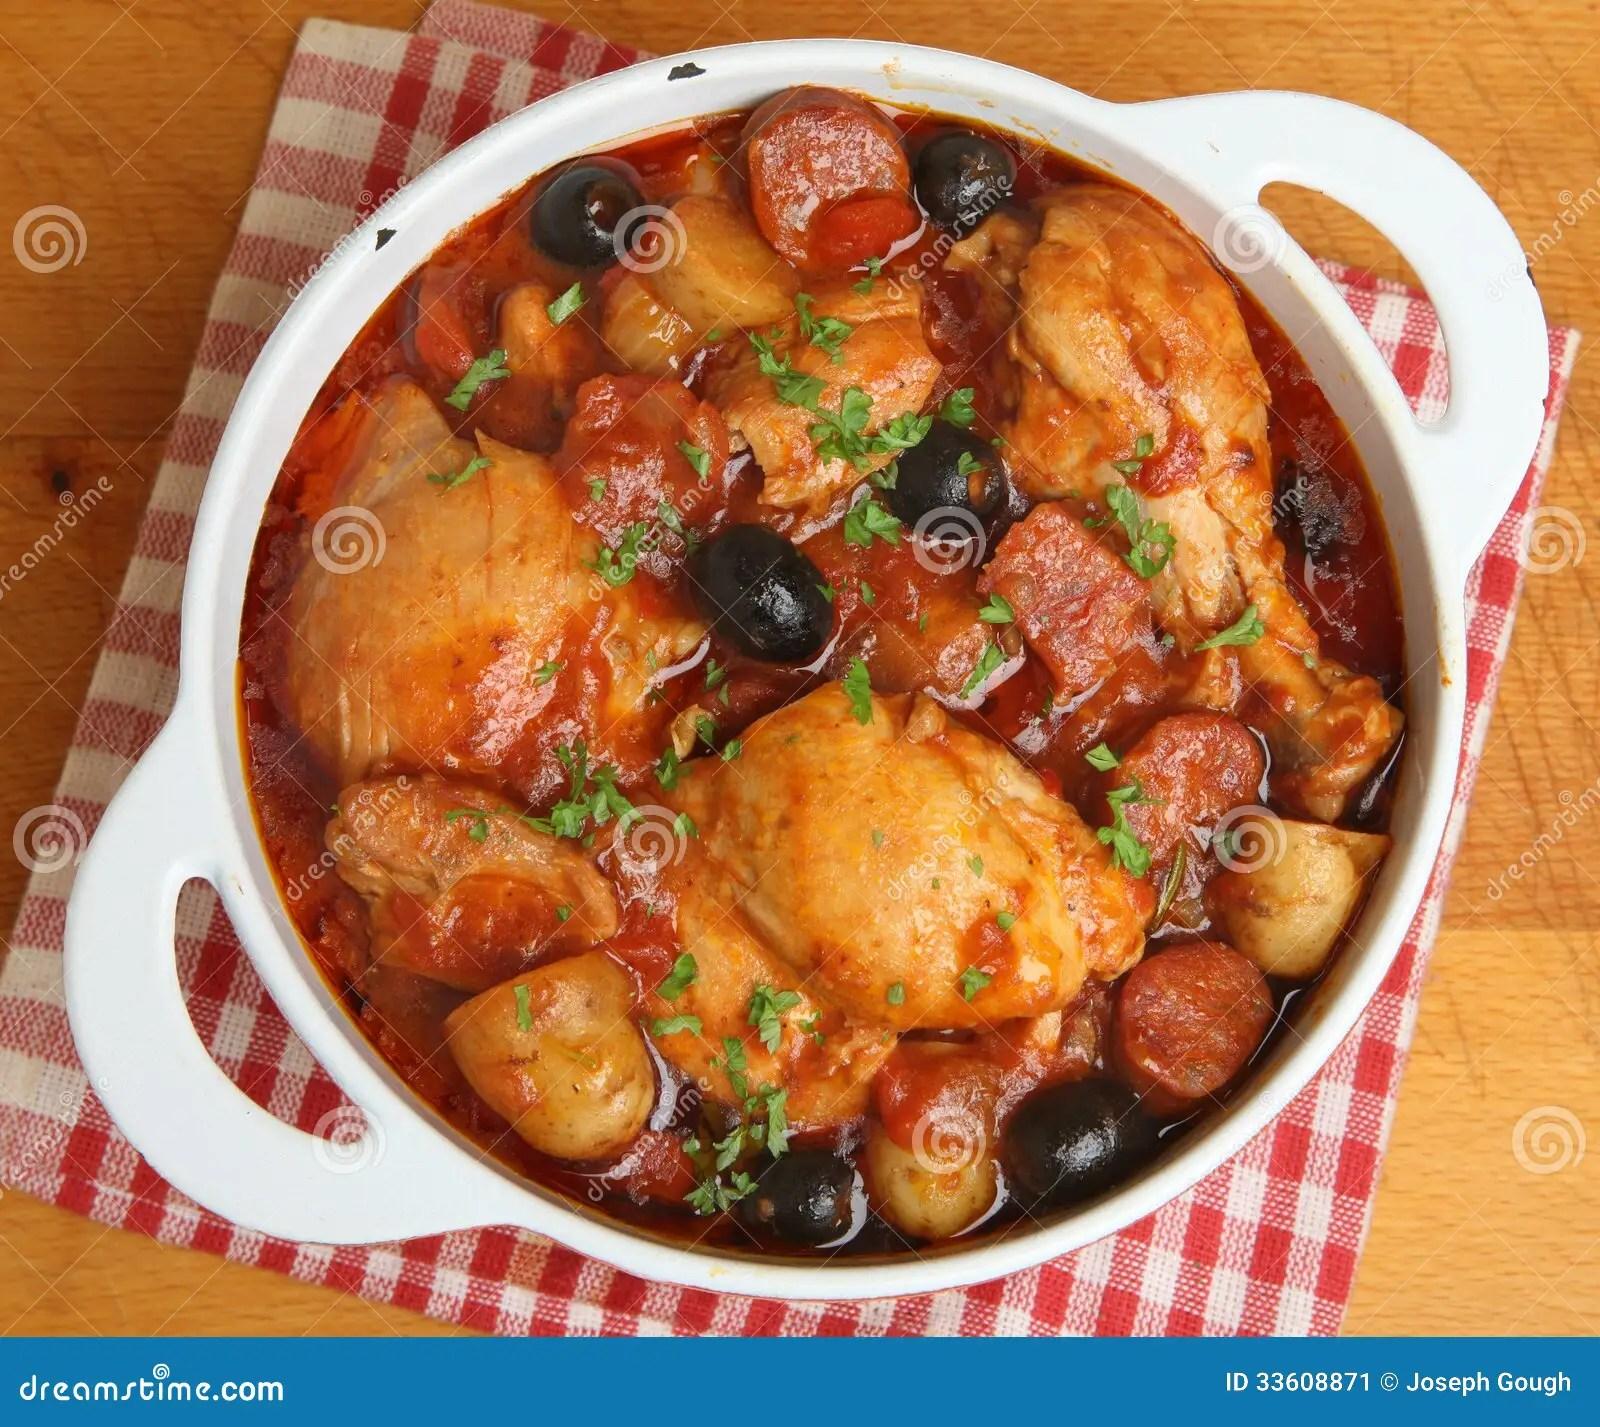 Spanish Chicken Stew With Potatoes